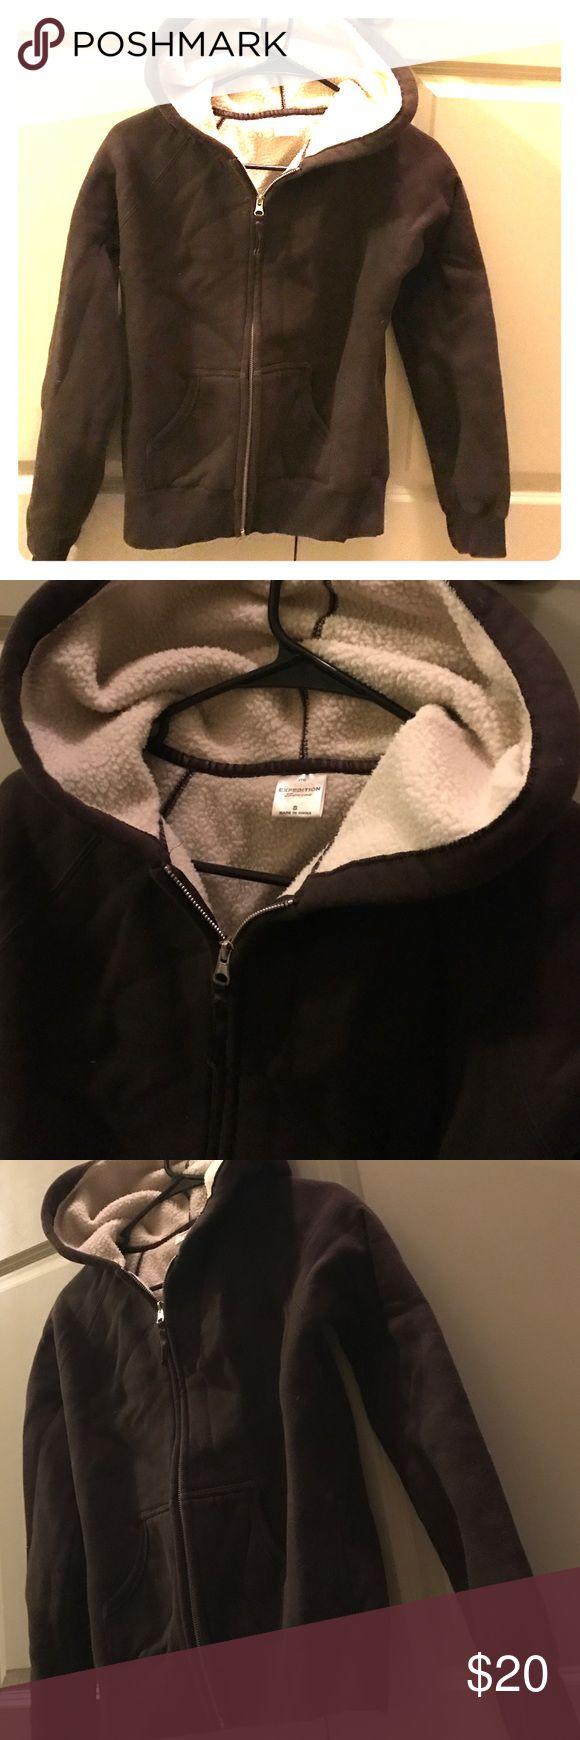 "Brown fleece zip up hoodie Never been worn. Brown zip up hoodie. Back is embroidered with words  ""German shorthair pointer"" Tops Sweatshirts & Hoodies"